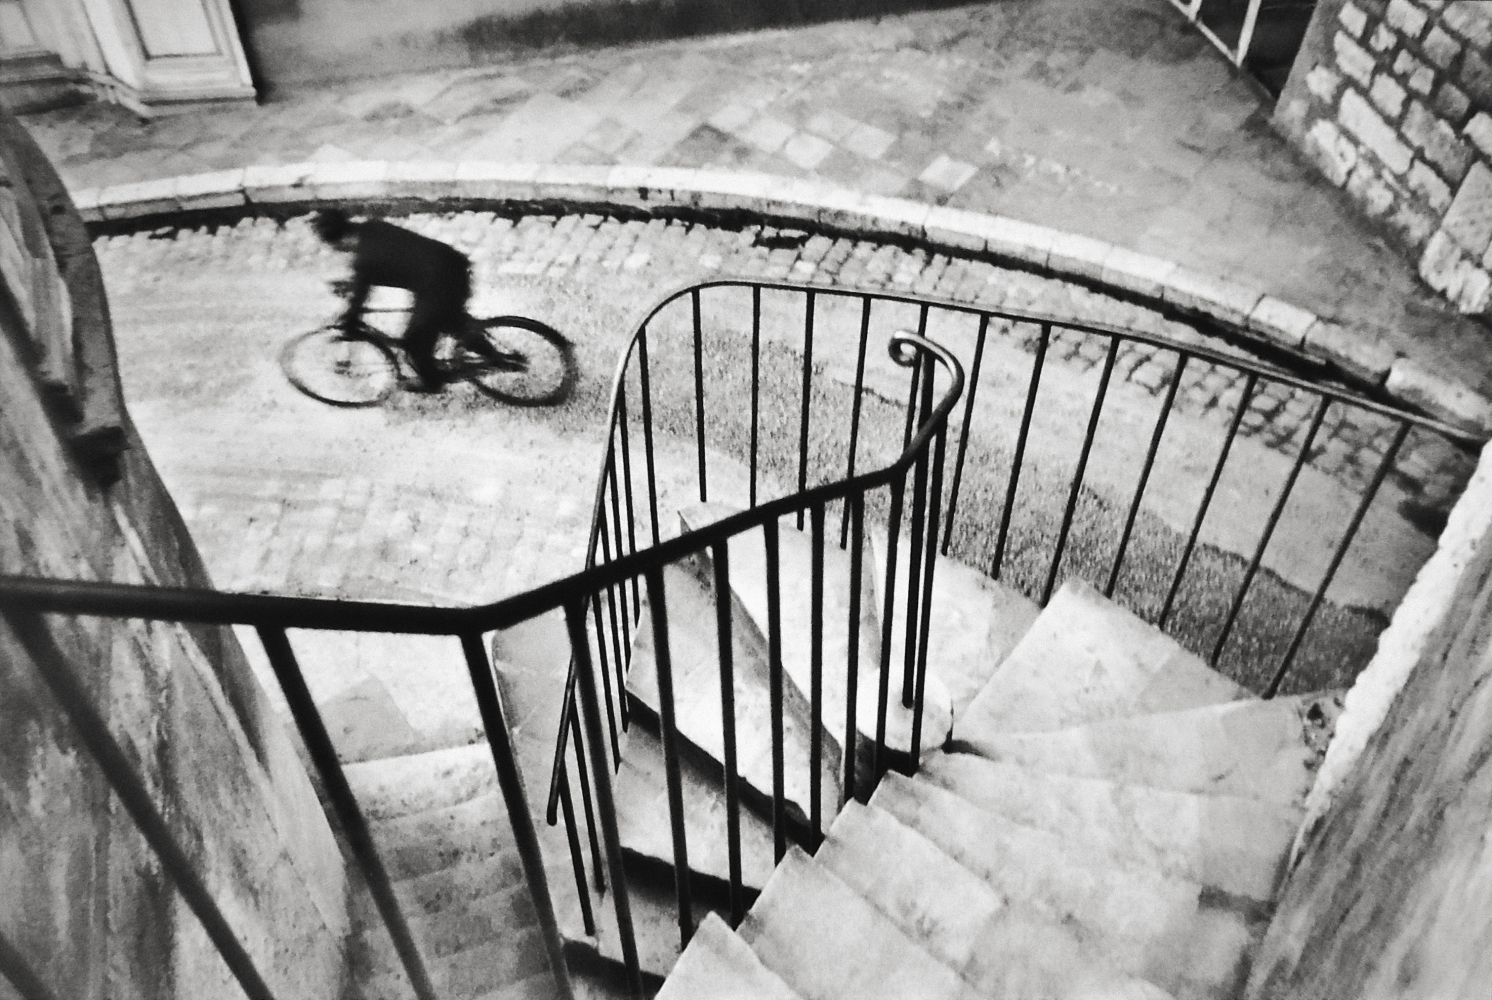 henri cartier-bresson, Heyeres France  1932. ©Henri Cartier-Bresson/Magnum Photo. Courtesy Peter Fetterman Gallery.